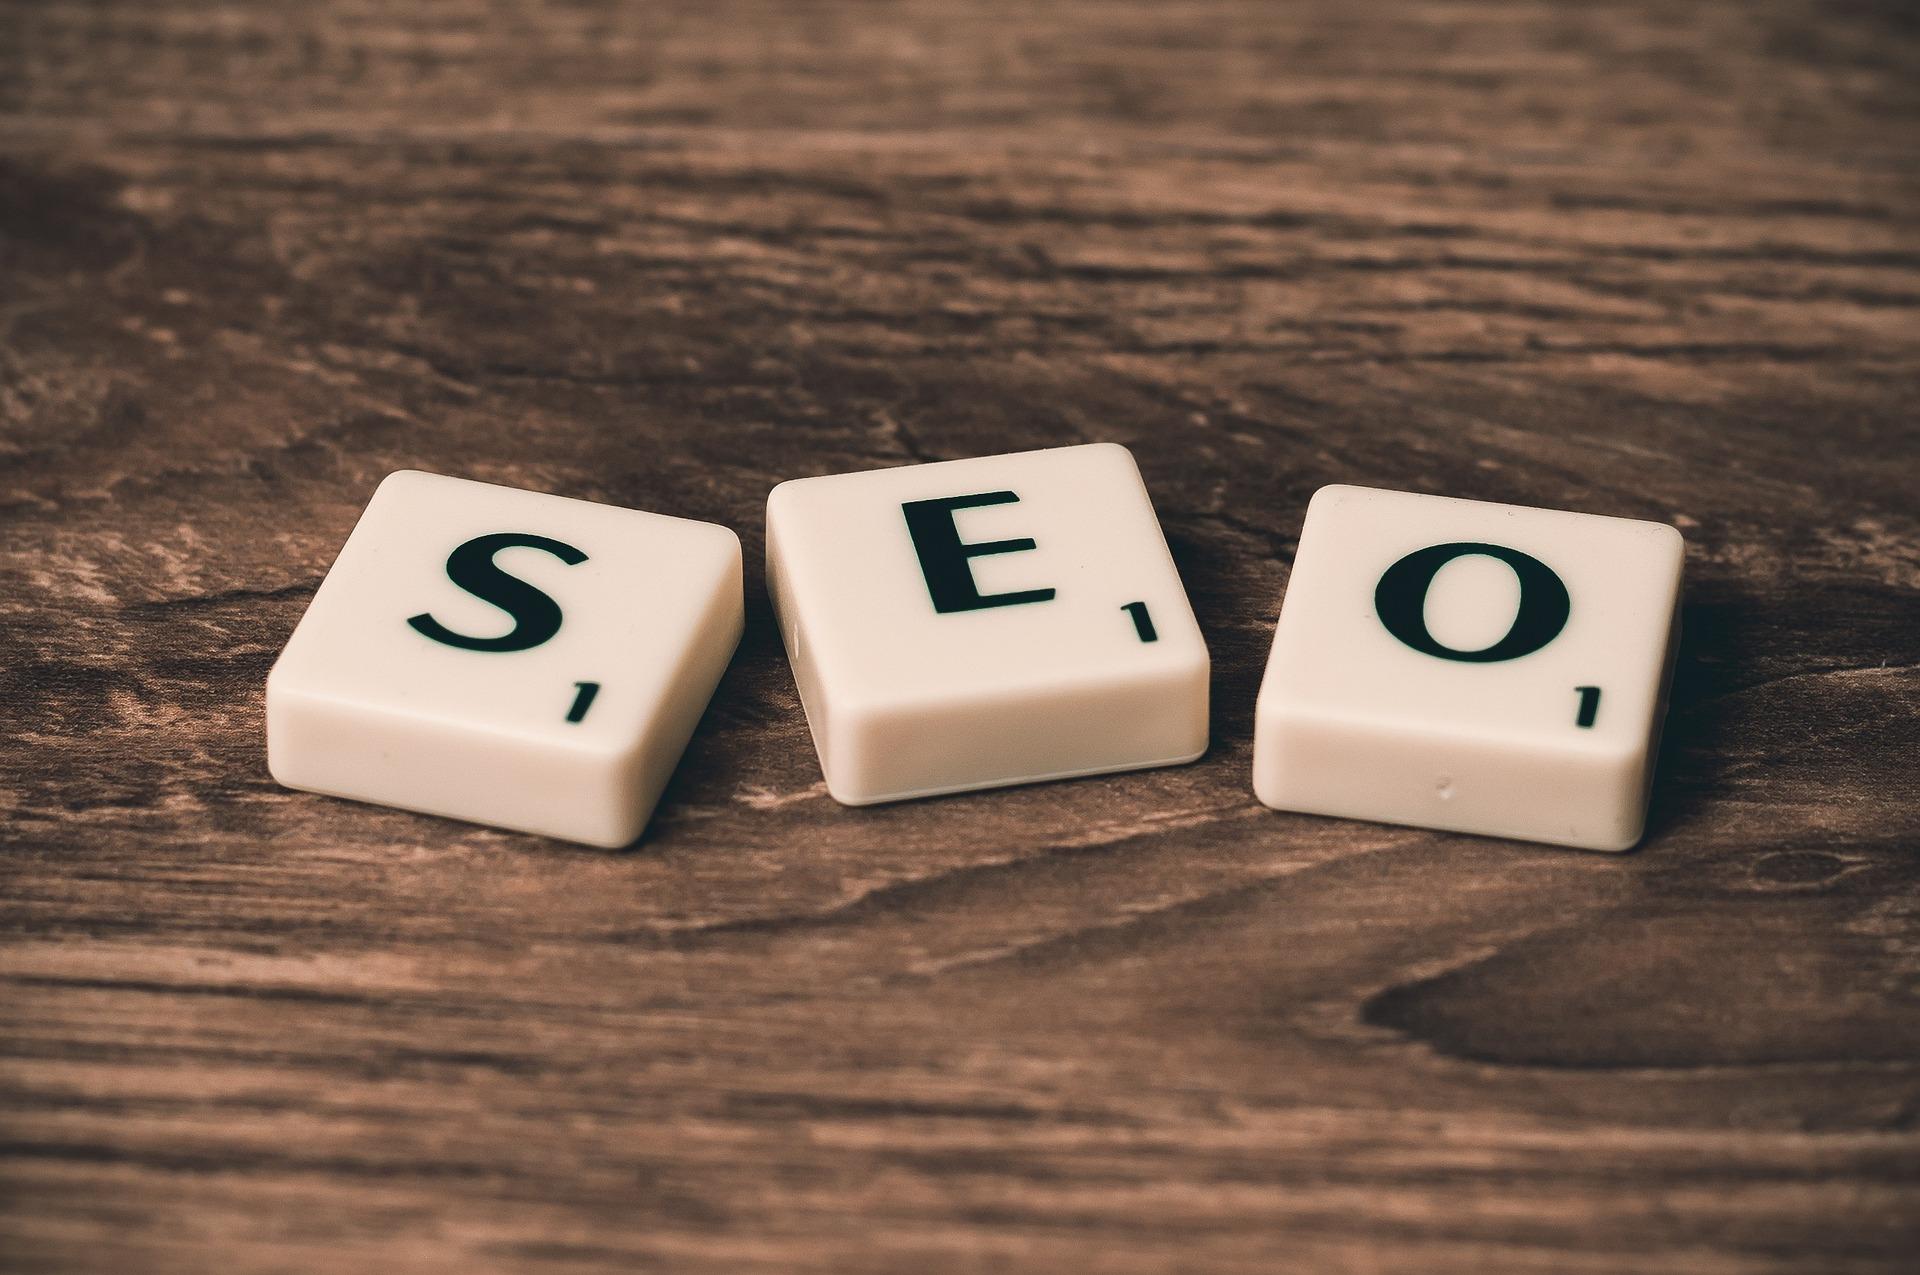 Search engine optimization (SEO) works like a champ